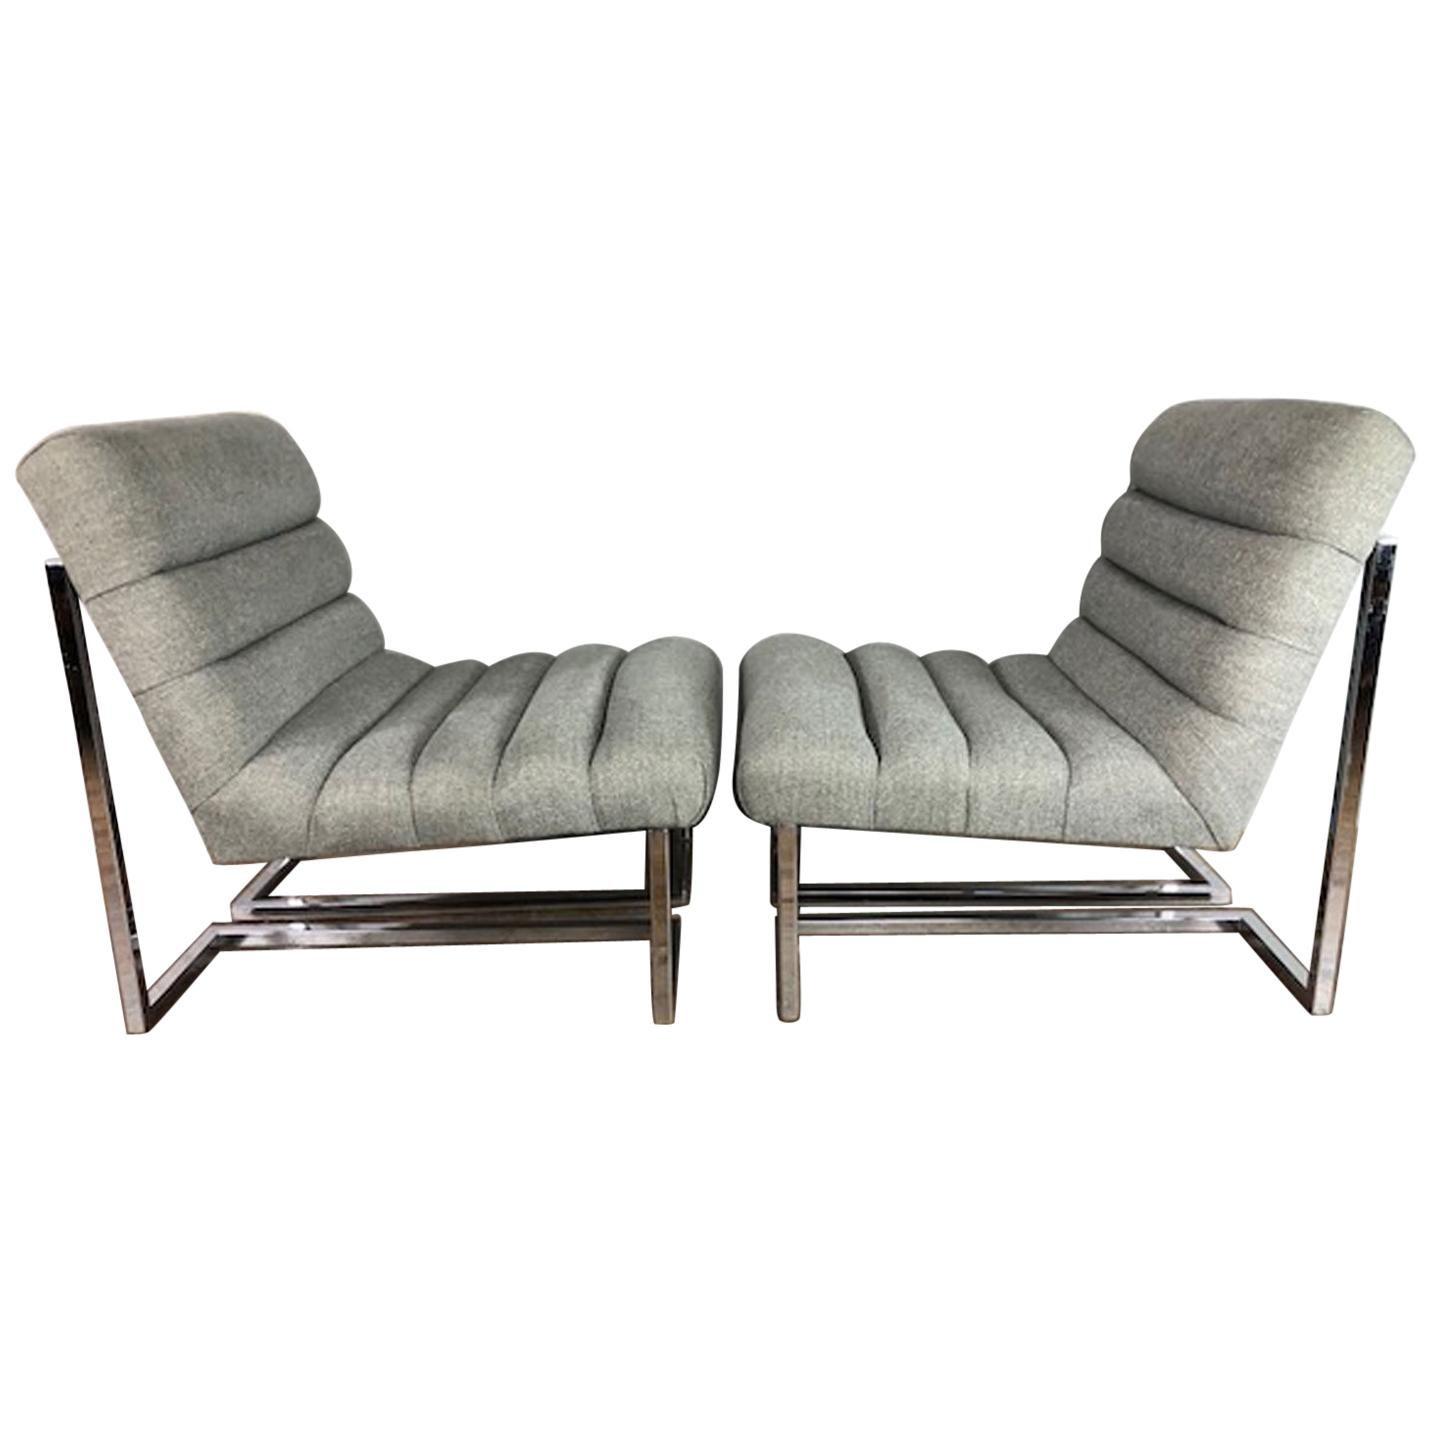 Charmant Swaim Design Lounge Chairs